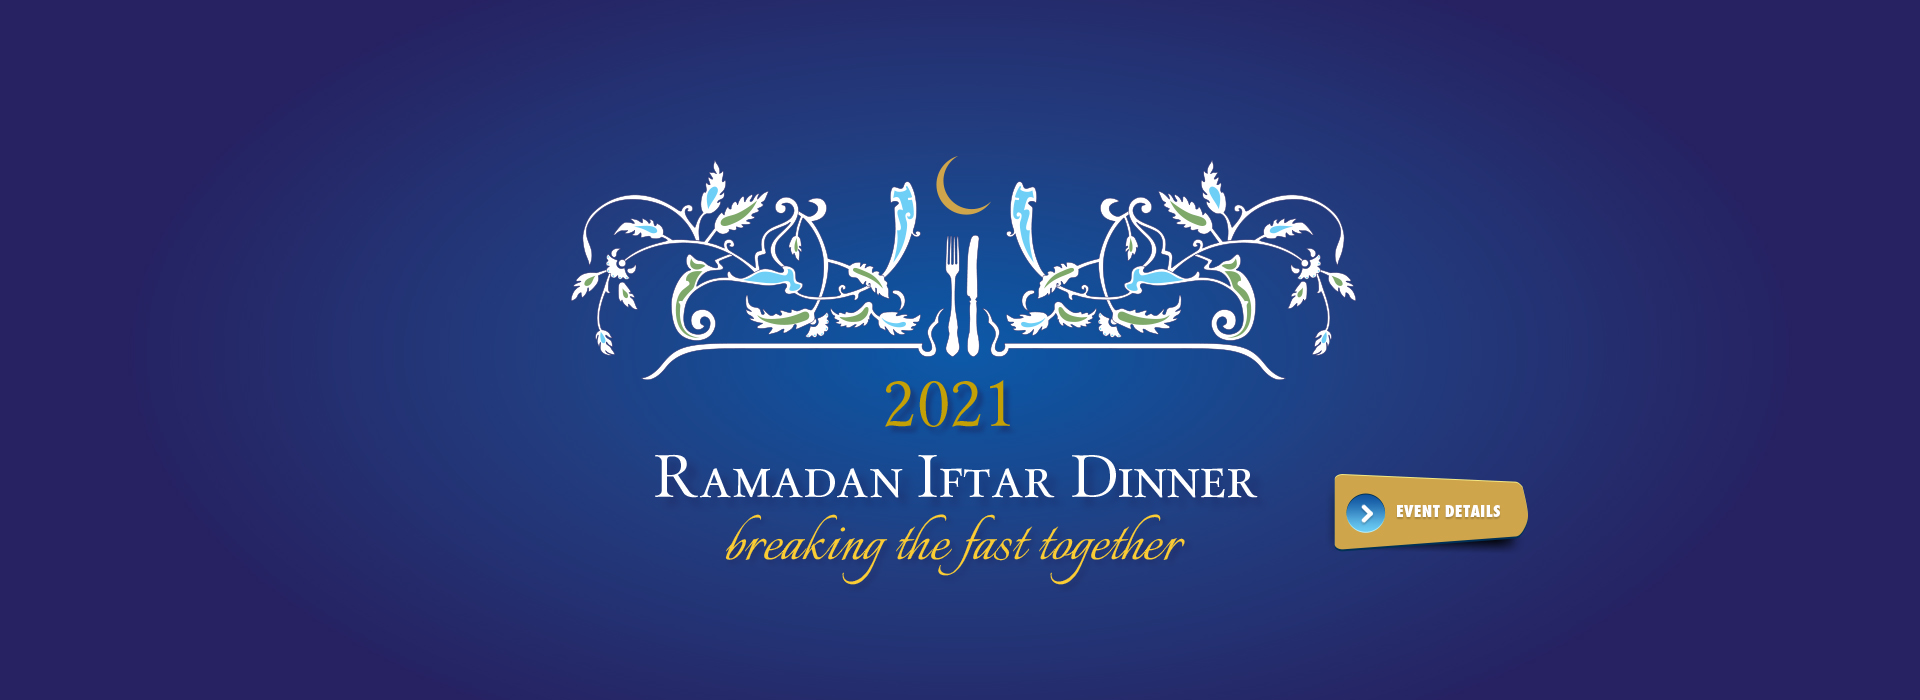 Ramadan-Iftar-Home-Slide-2021